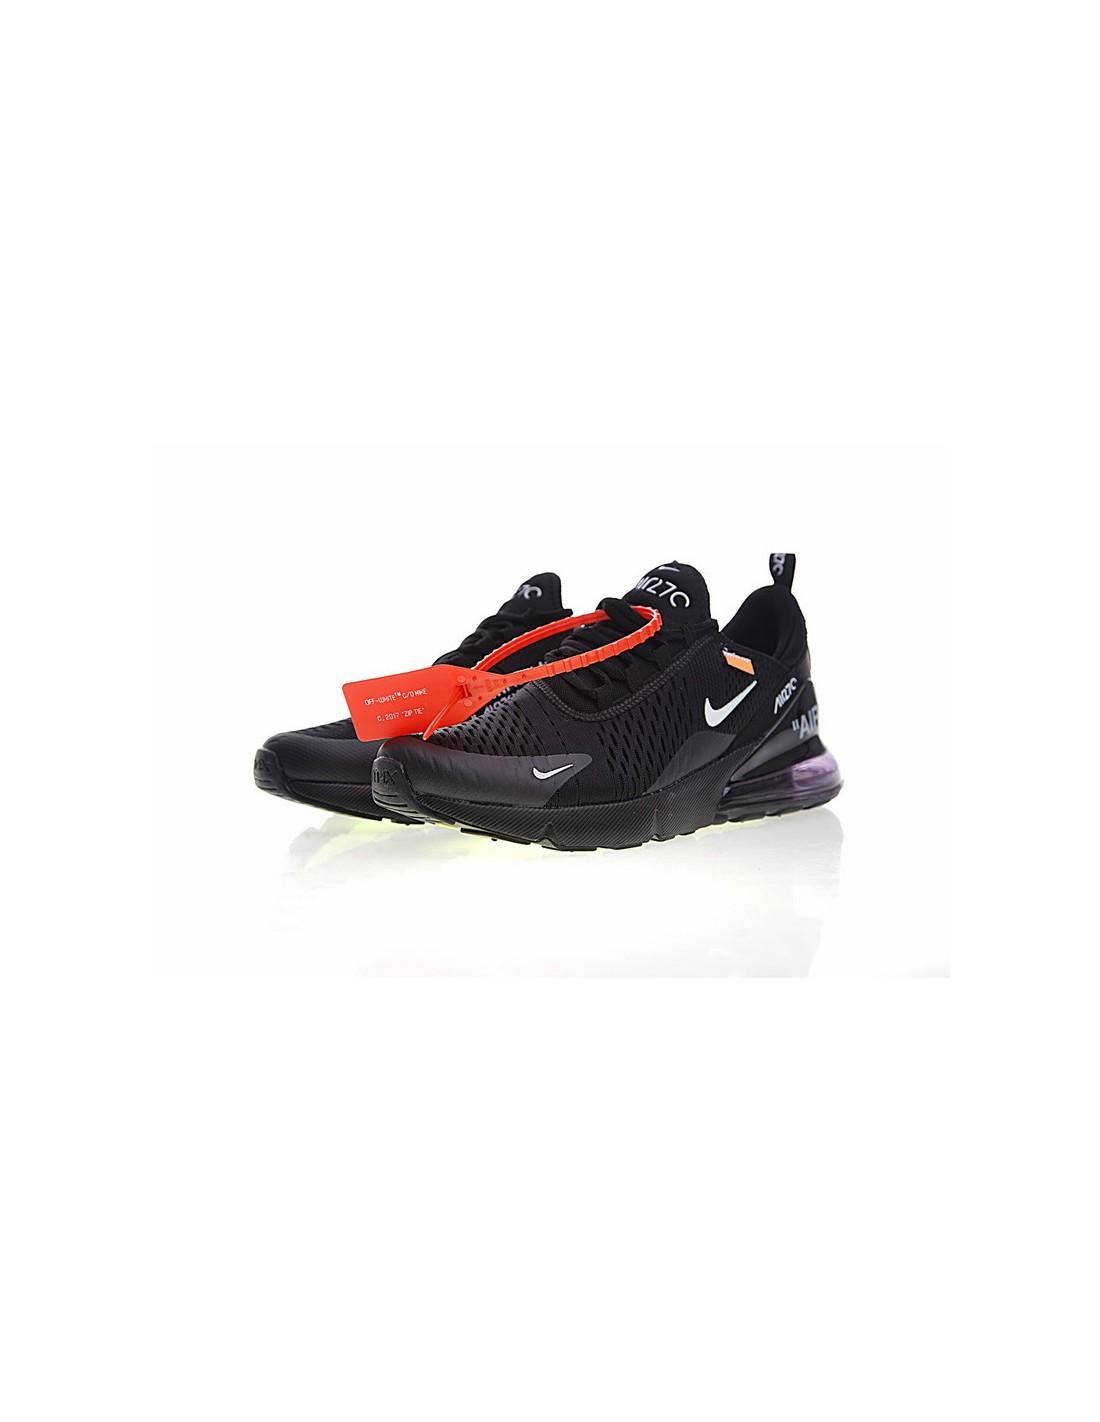 separation shoes 1a01e 45b52 Air Max 270 x OFF WHITE